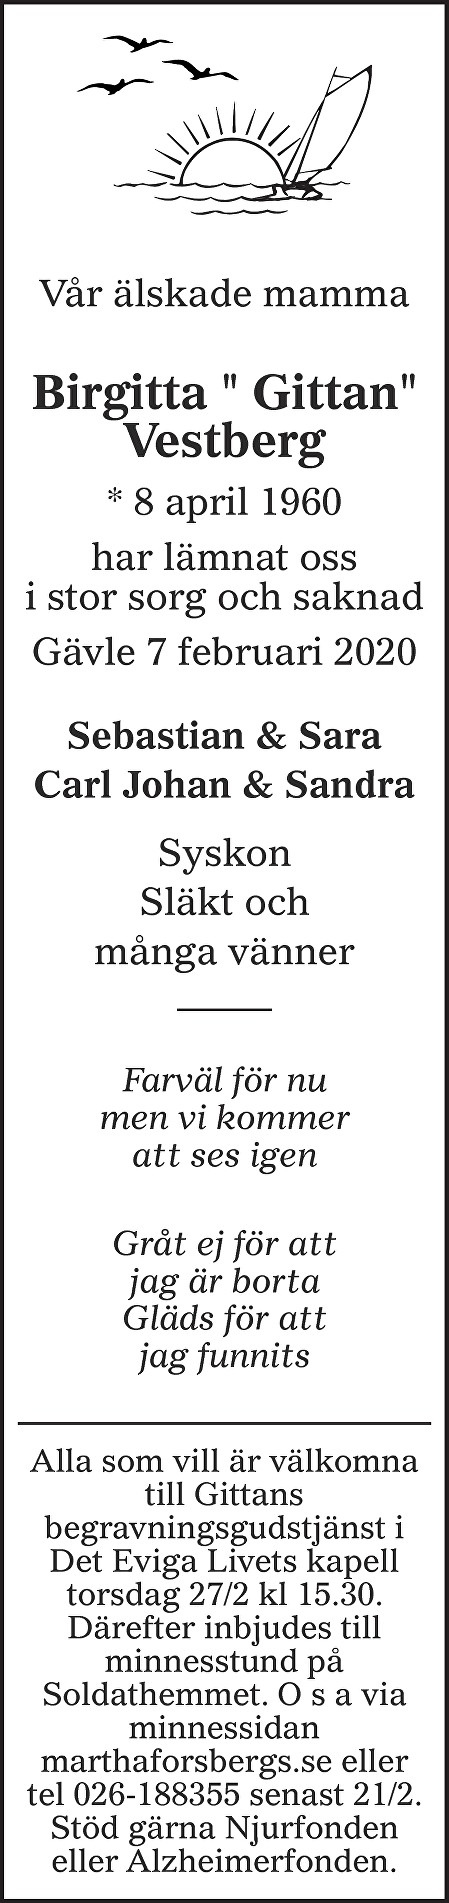 "Birgitta "" Gittan"" Vestberg Death notice"